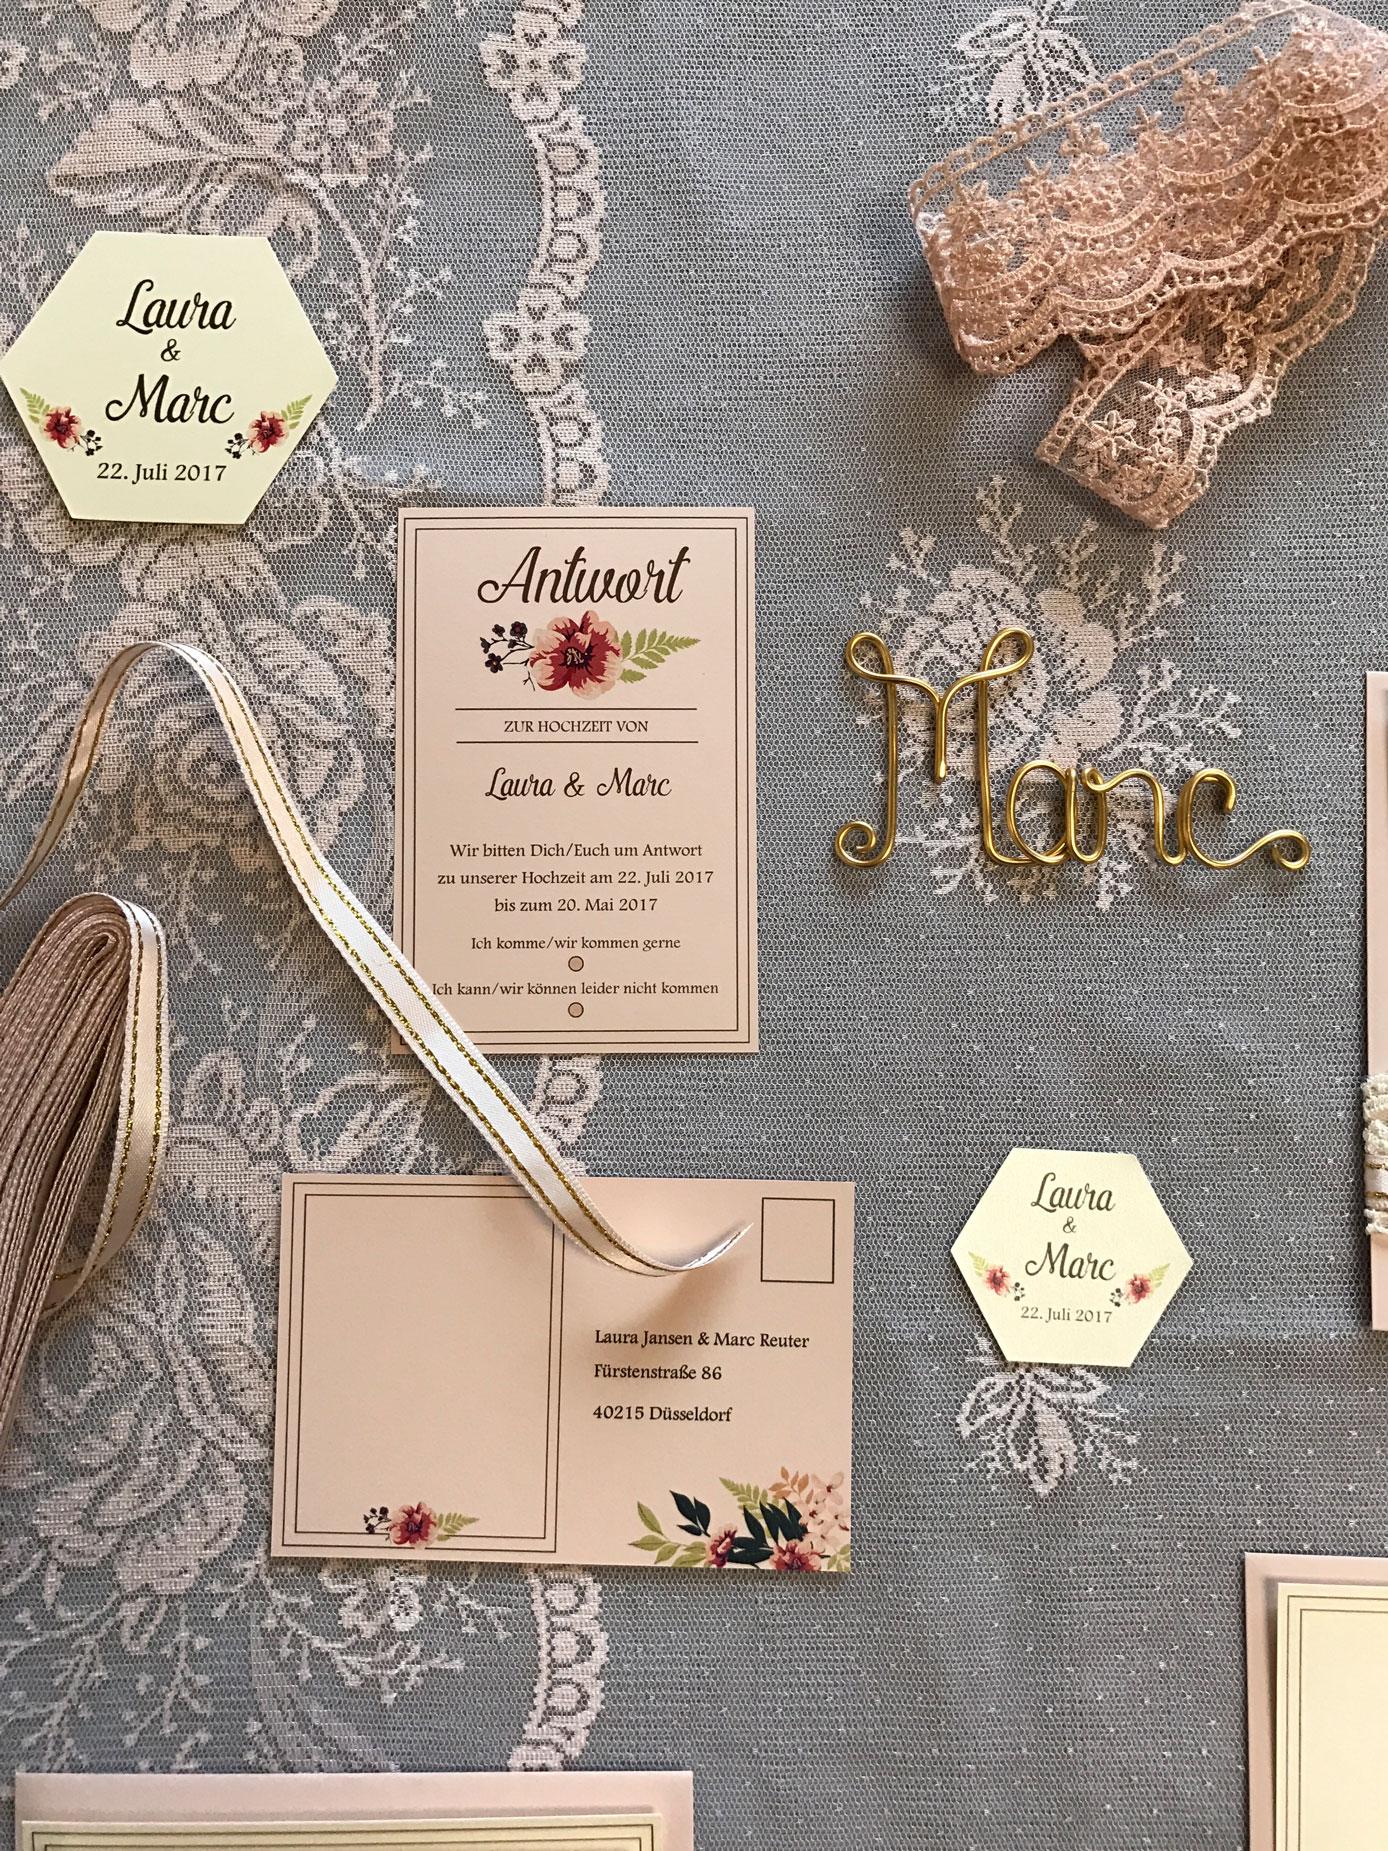 img 3178 the wedding table. Black Bedroom Furniture Sets. Home Design Ideas